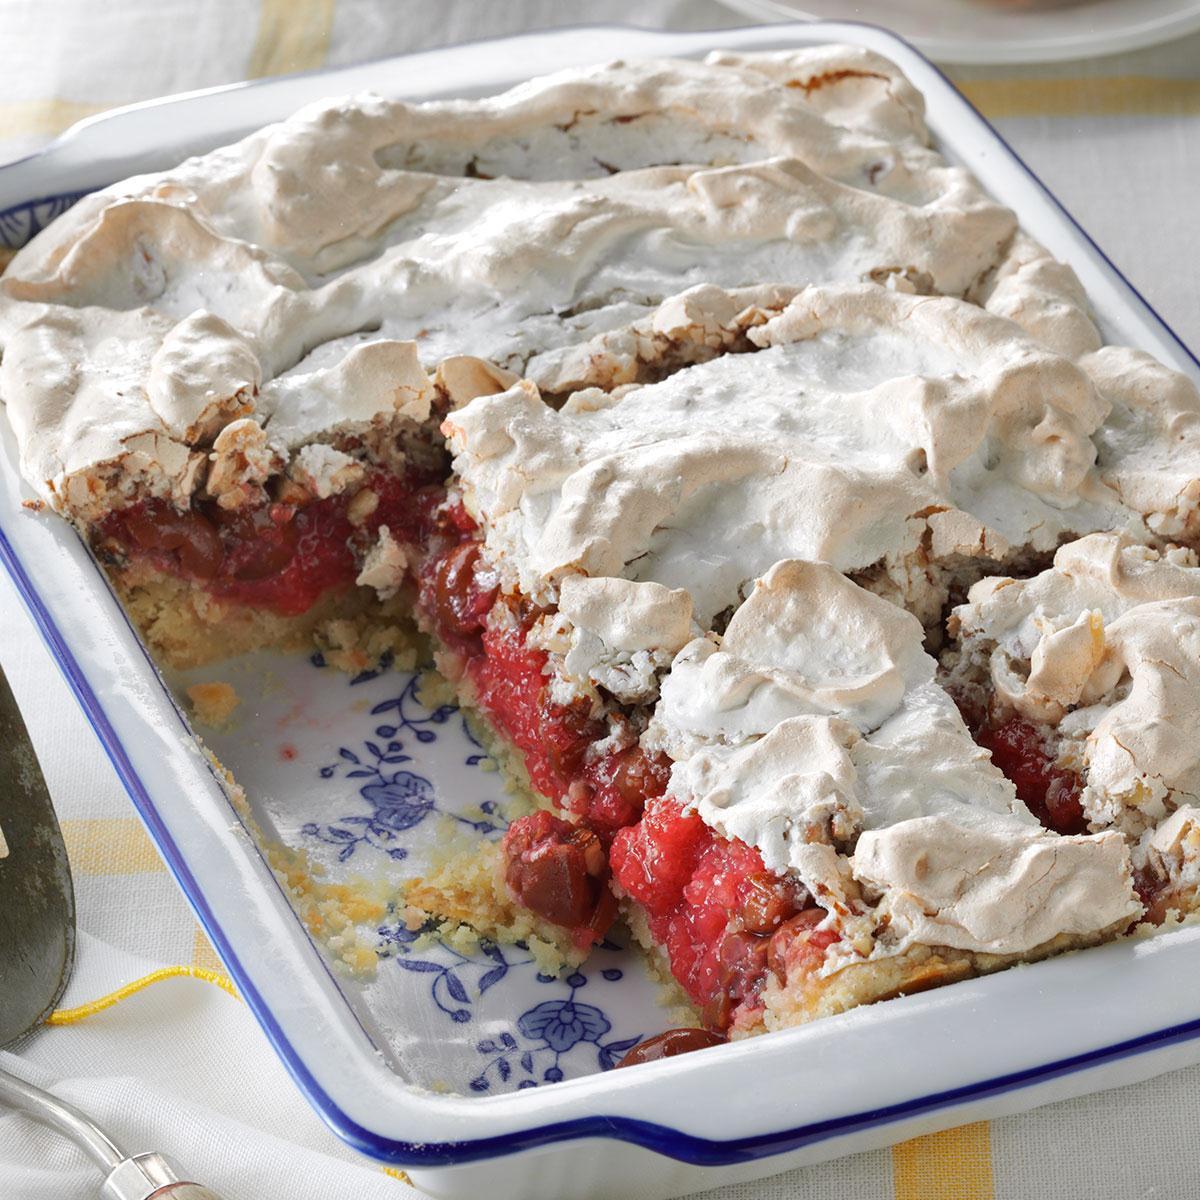 Taste Of Homes Desserts  Tart Cherry Meringue Dessert Recipe